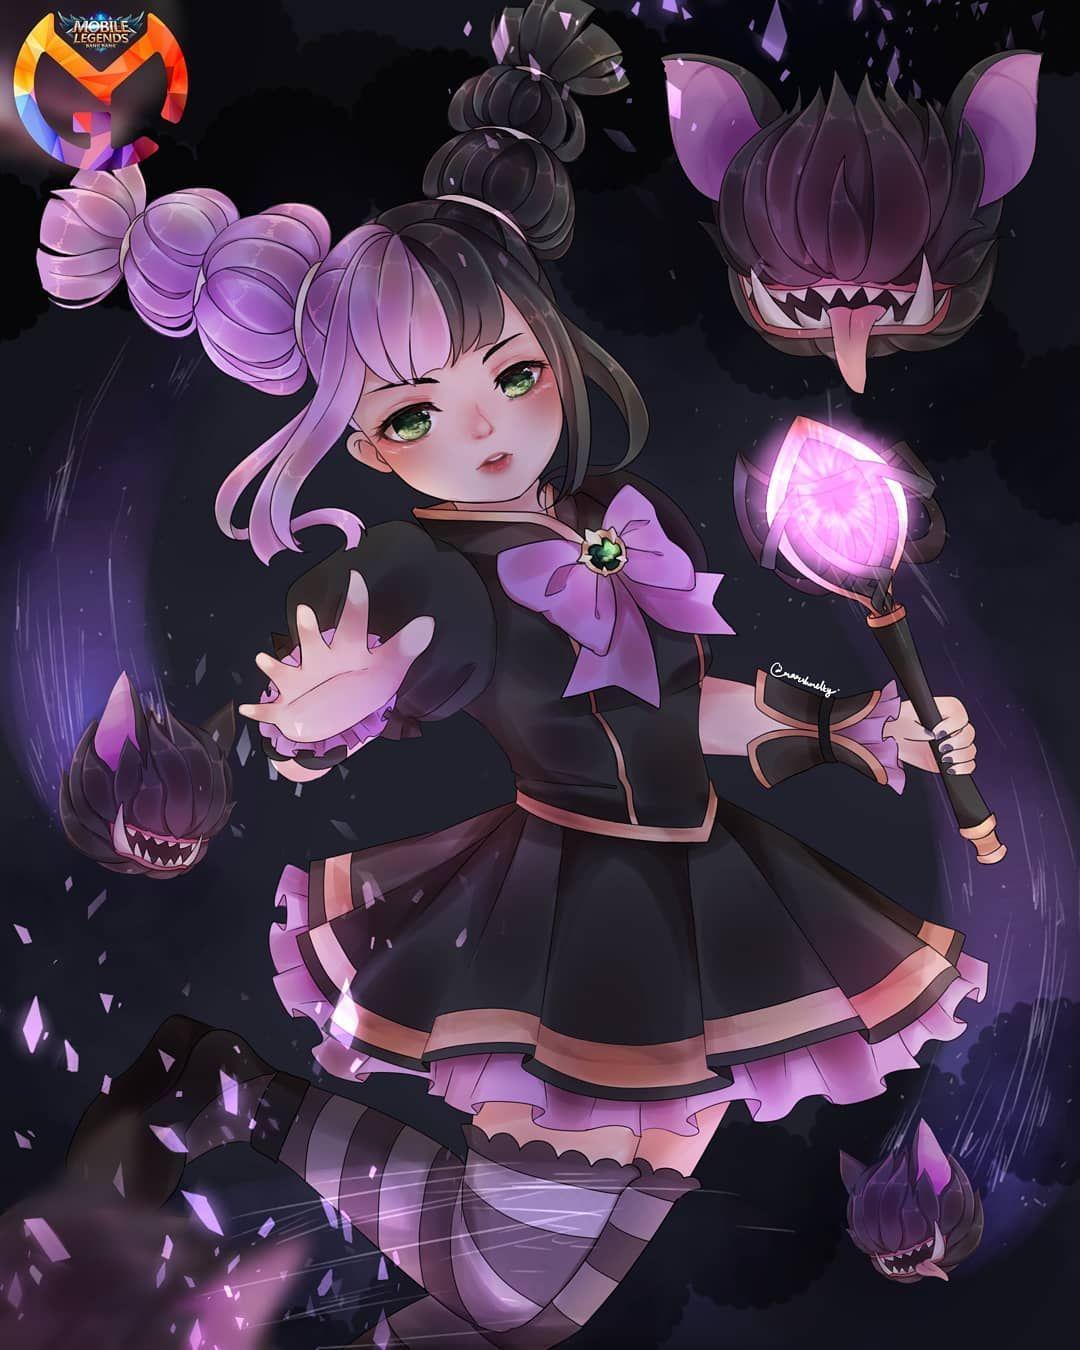 Lylia Uwu Mlbbmgl Mlbbfanart Mgllylia Mlbblylia Lyliamlbb Lylia Cute Witch Purple Goth Artwork Fanar Seni Anime Seni Desain Karakter Game